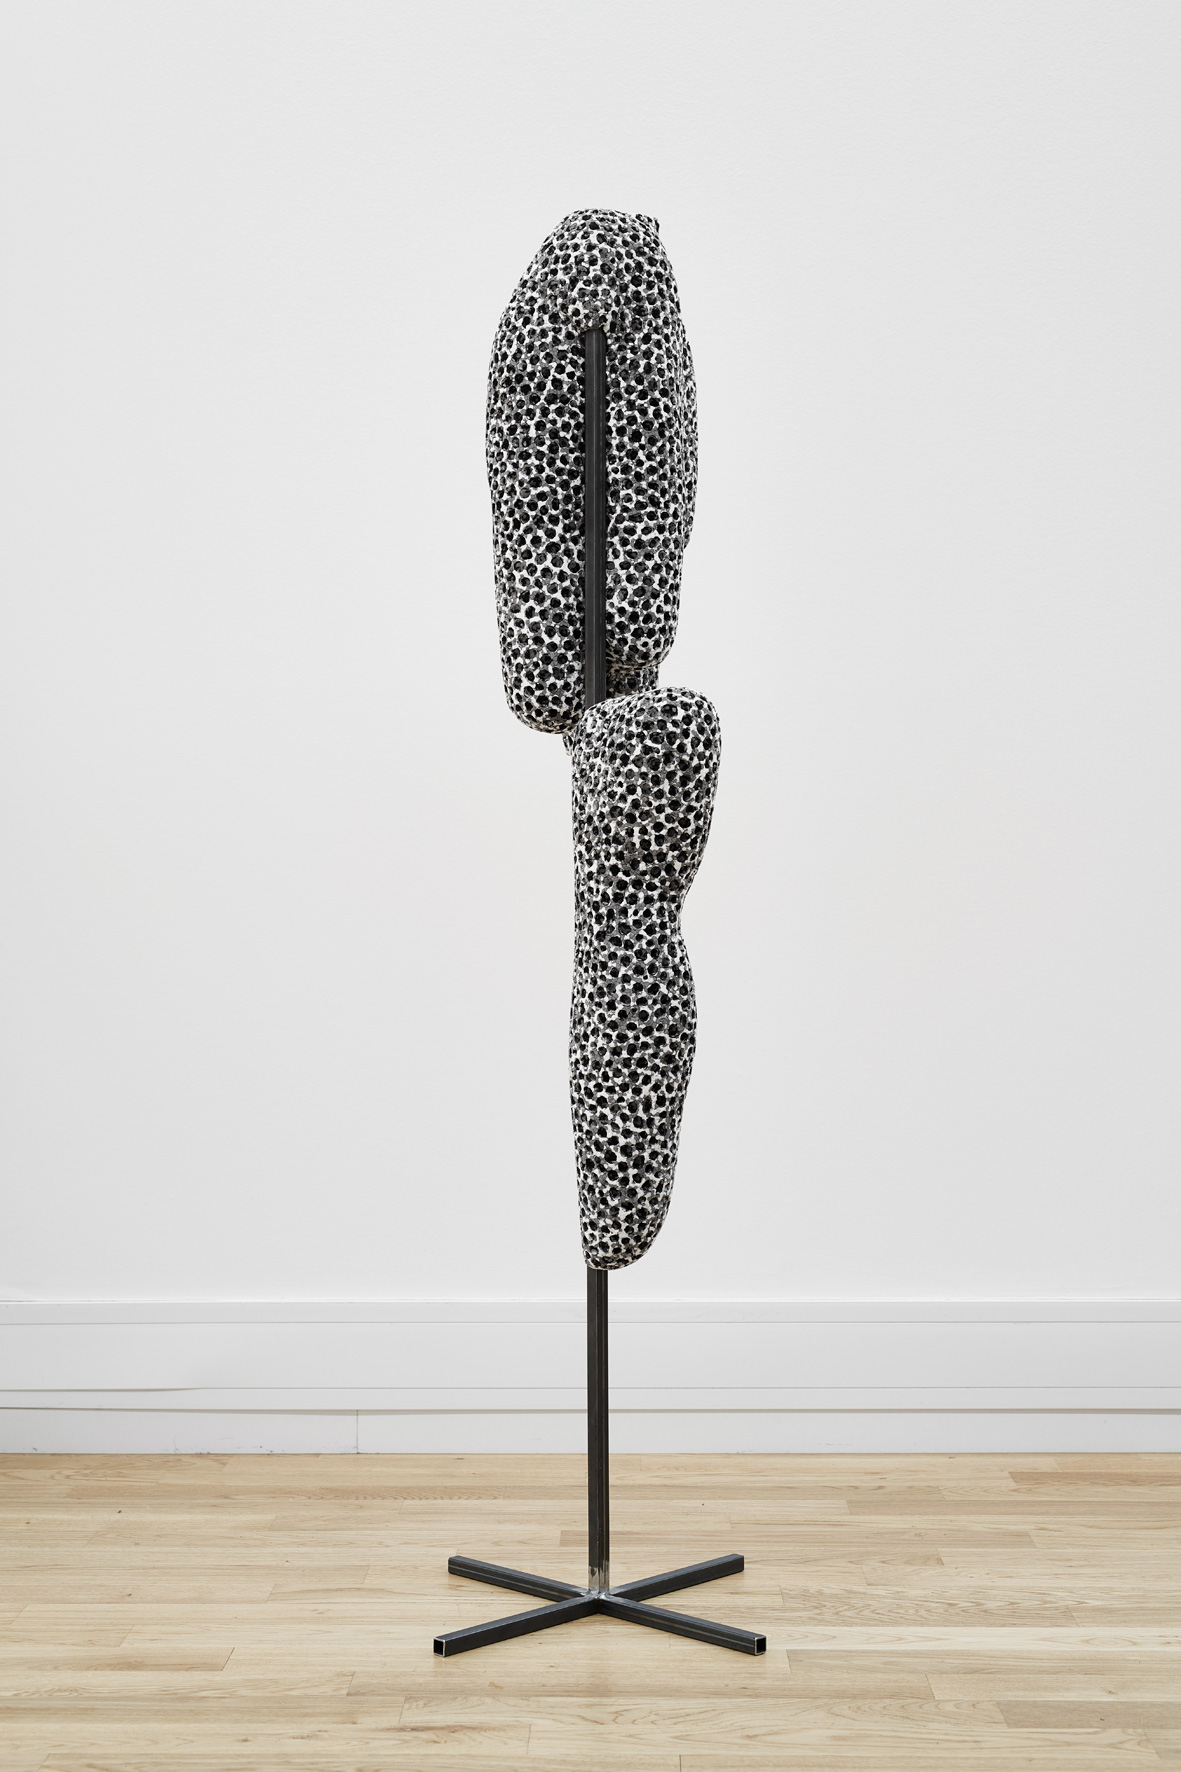 o. T. | 2018 | Eisen, Styropor, Acryl | 134 x 40 x 40 cm | ©GALERIE ALBER